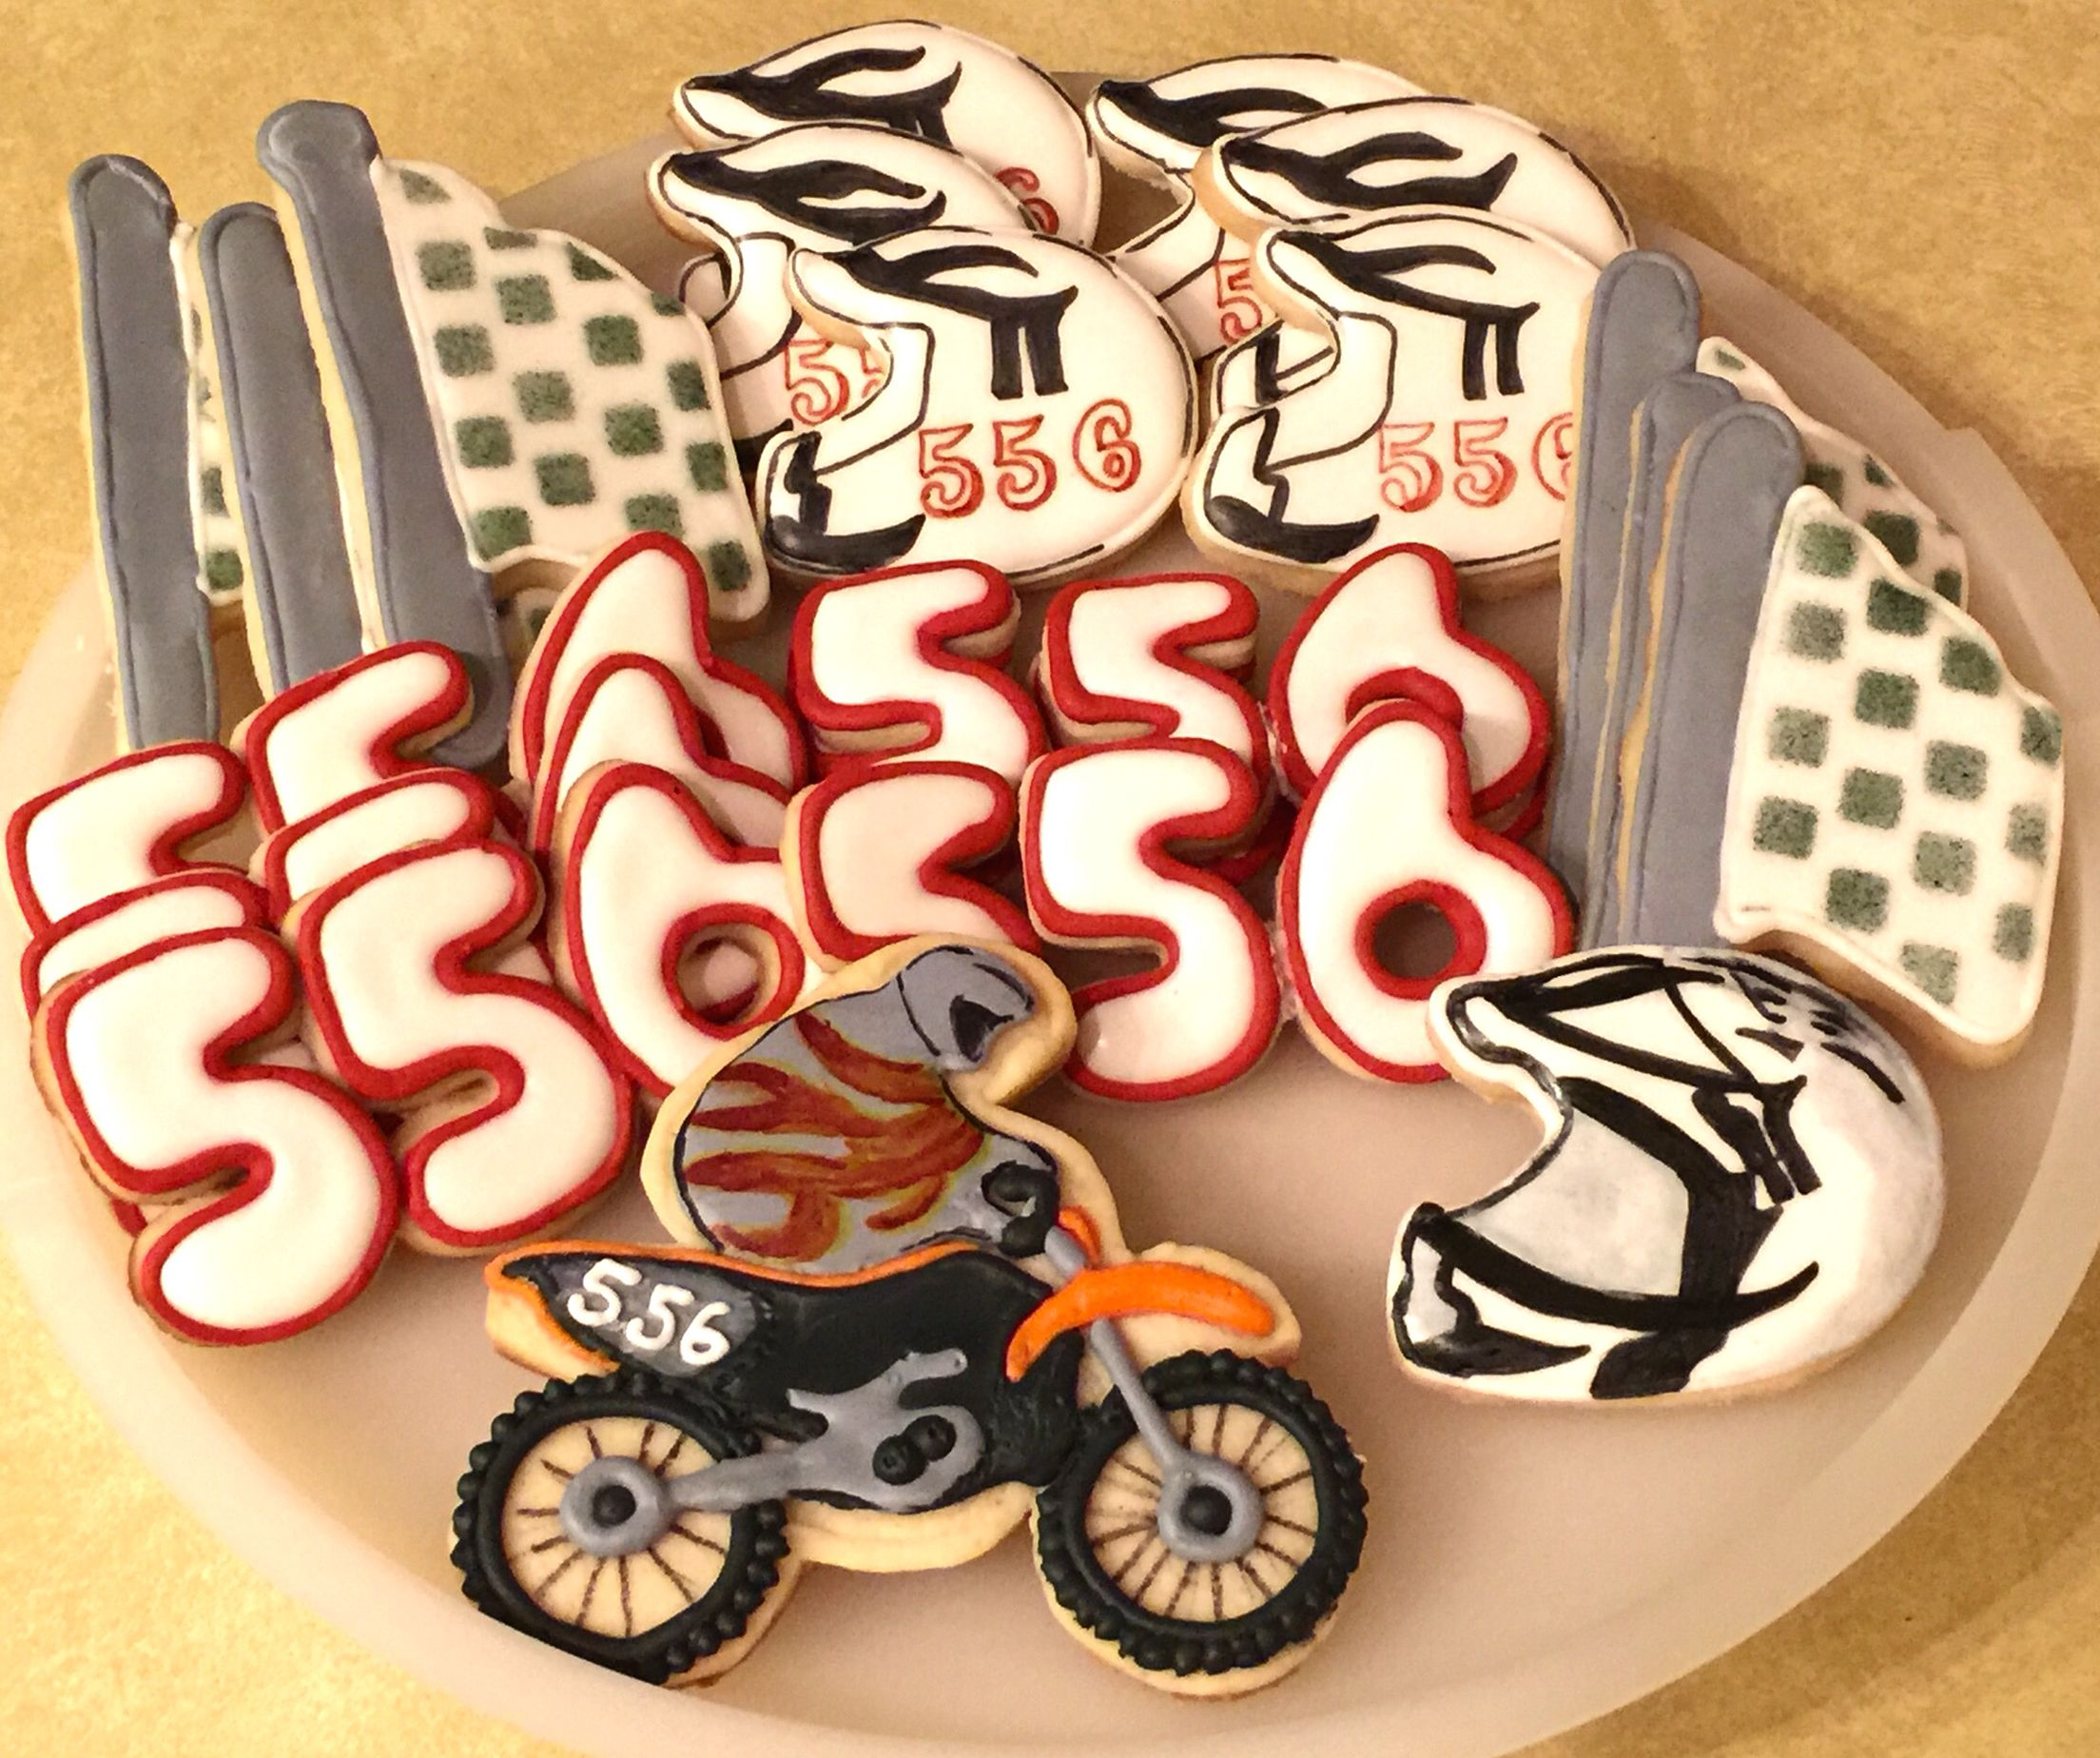 Personalized BMX Dirt Bike Cookies